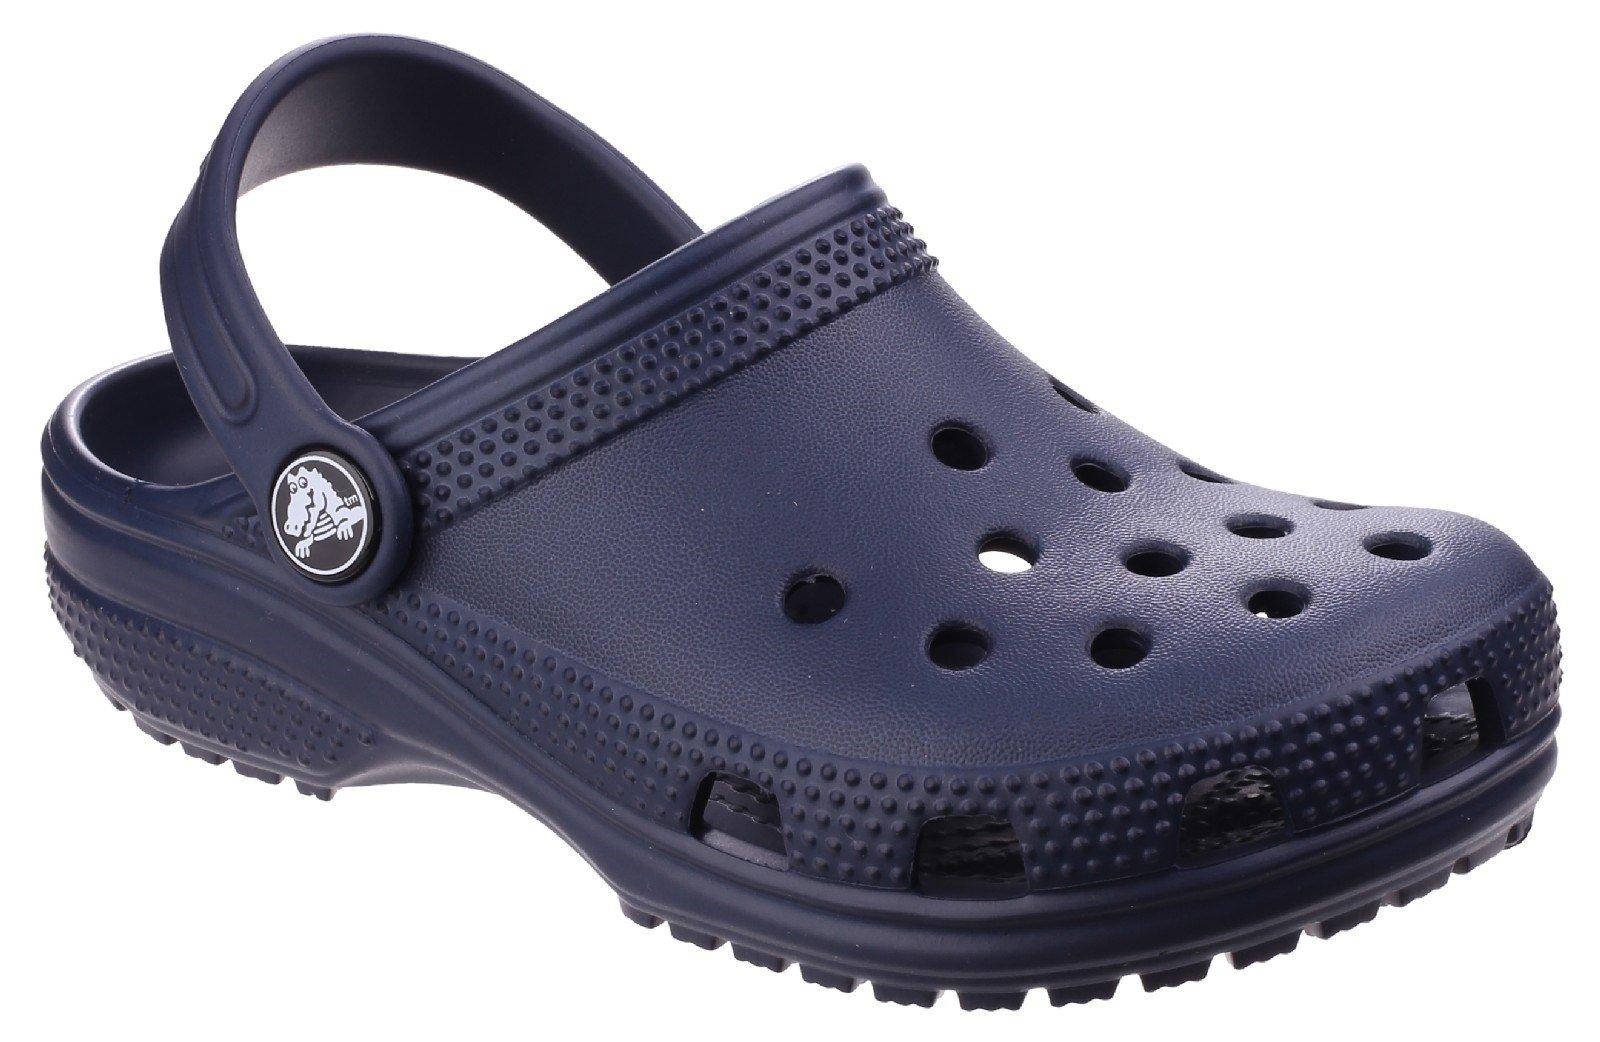 Crocs Kid's Classic Clog Slip On Sandal Various Colours 25239 - Navy 4 UK